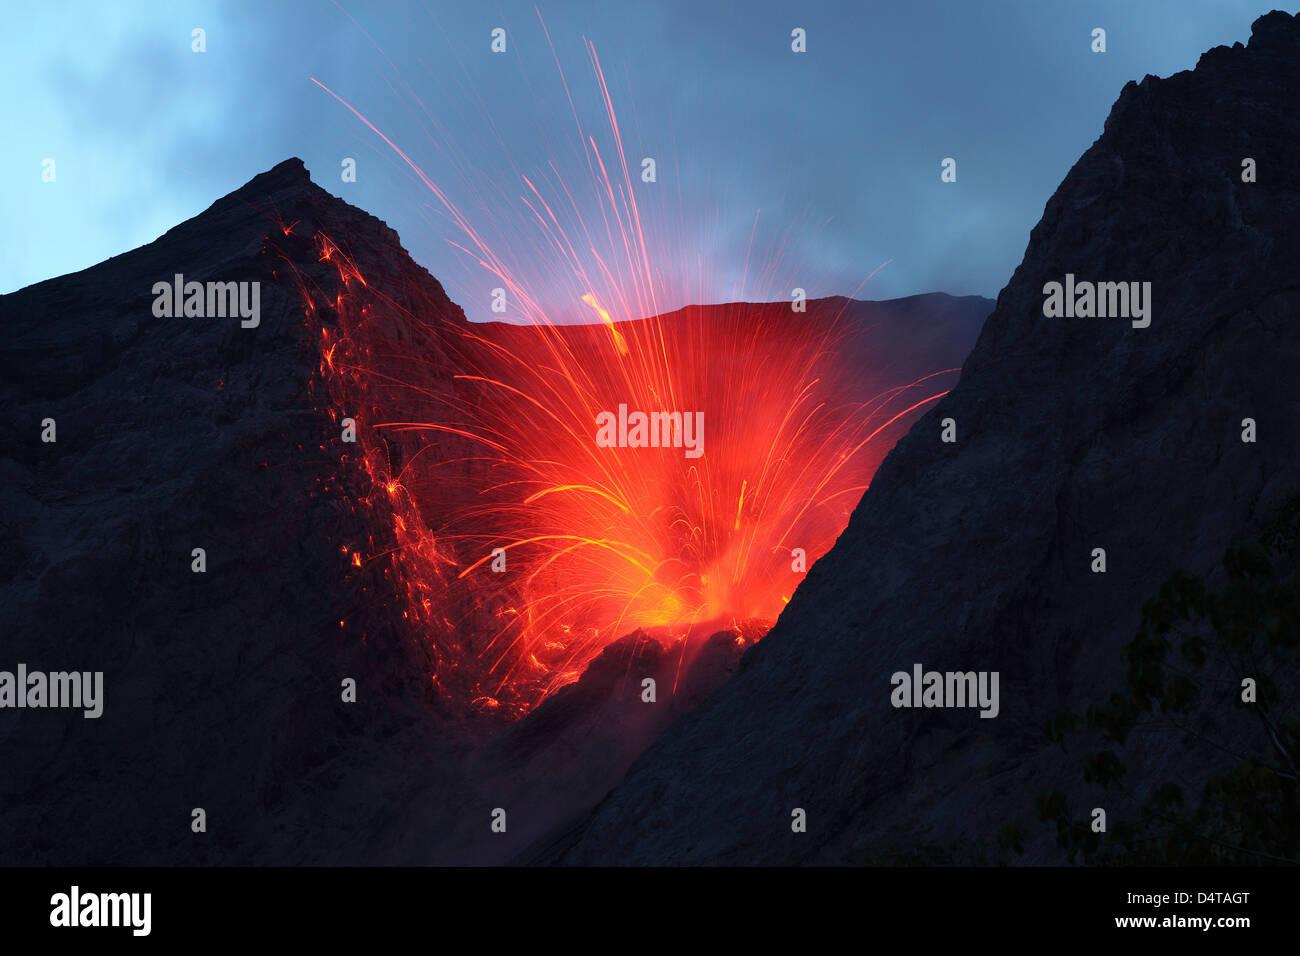 Strombolian type eruption of Batu Tara volcano, Indonesia. - Stock Image